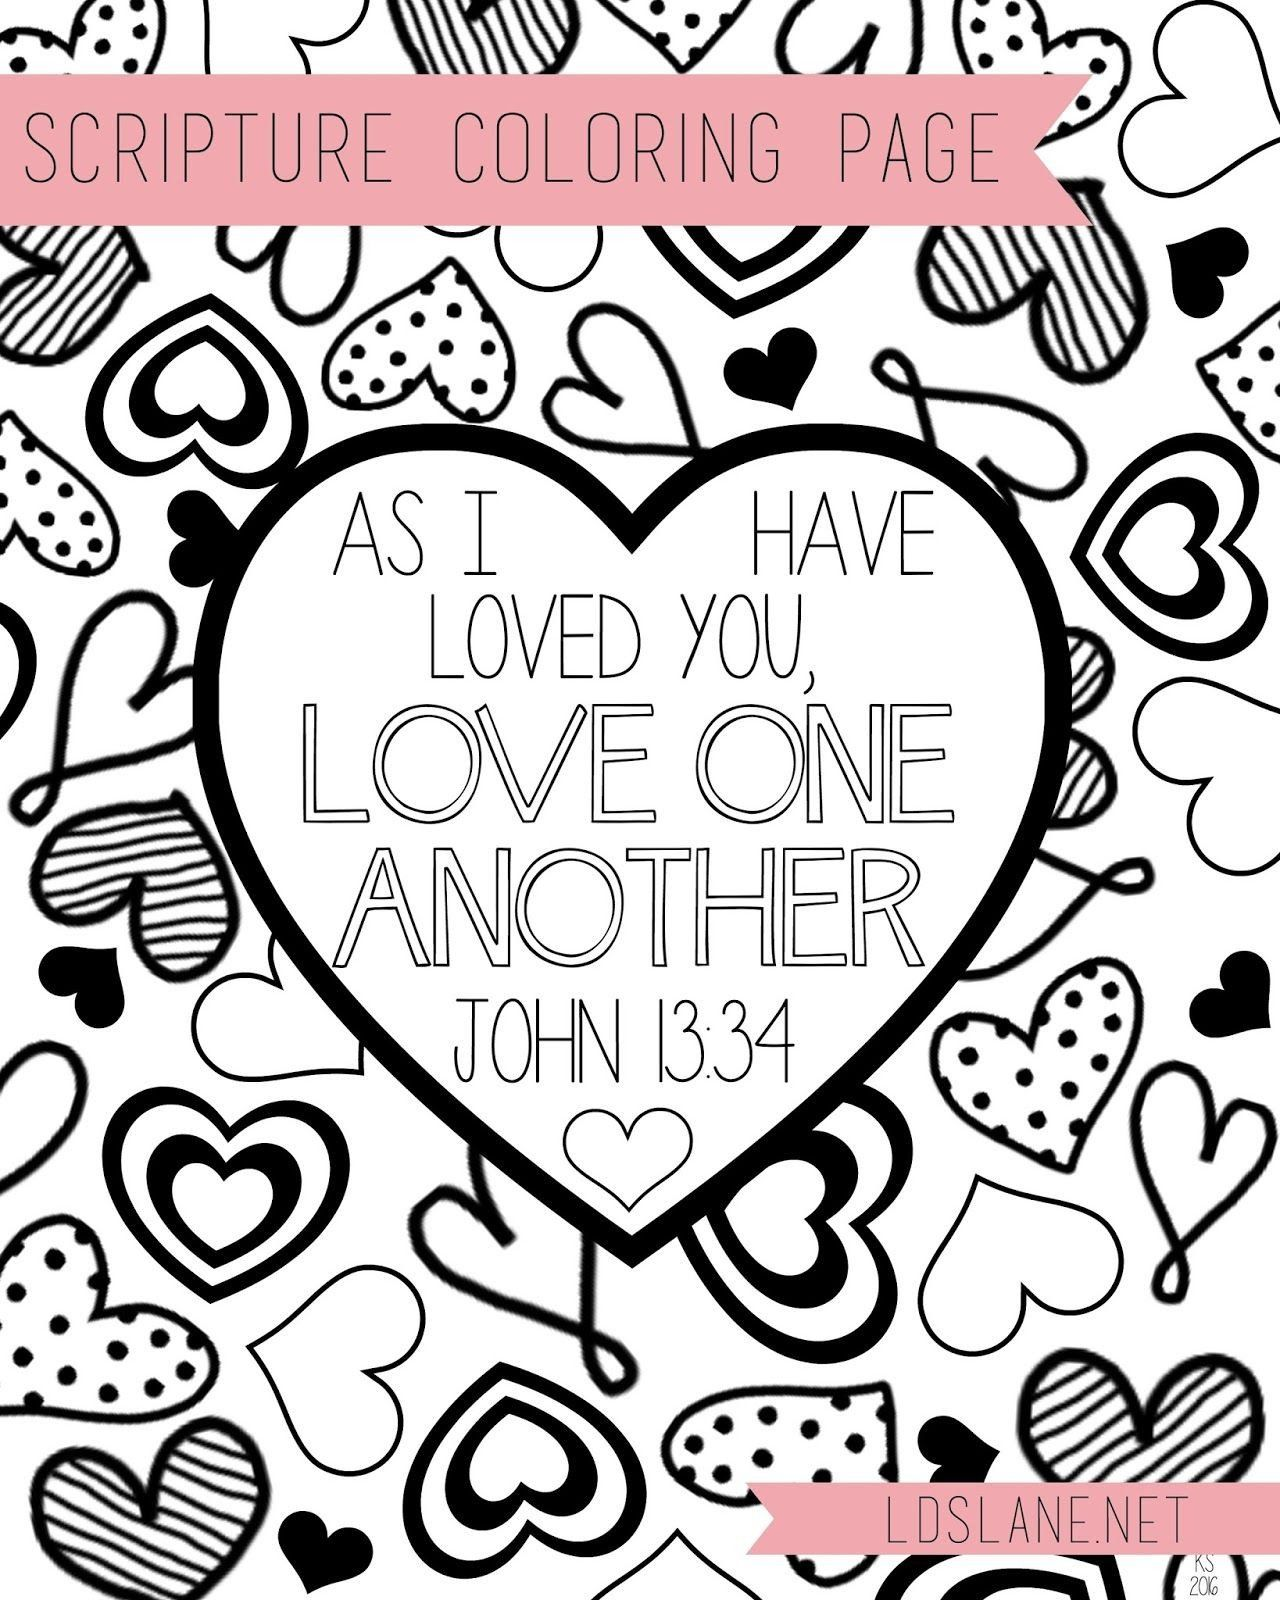 Jesus Loves Me Coloring Page Inspirational Valentine